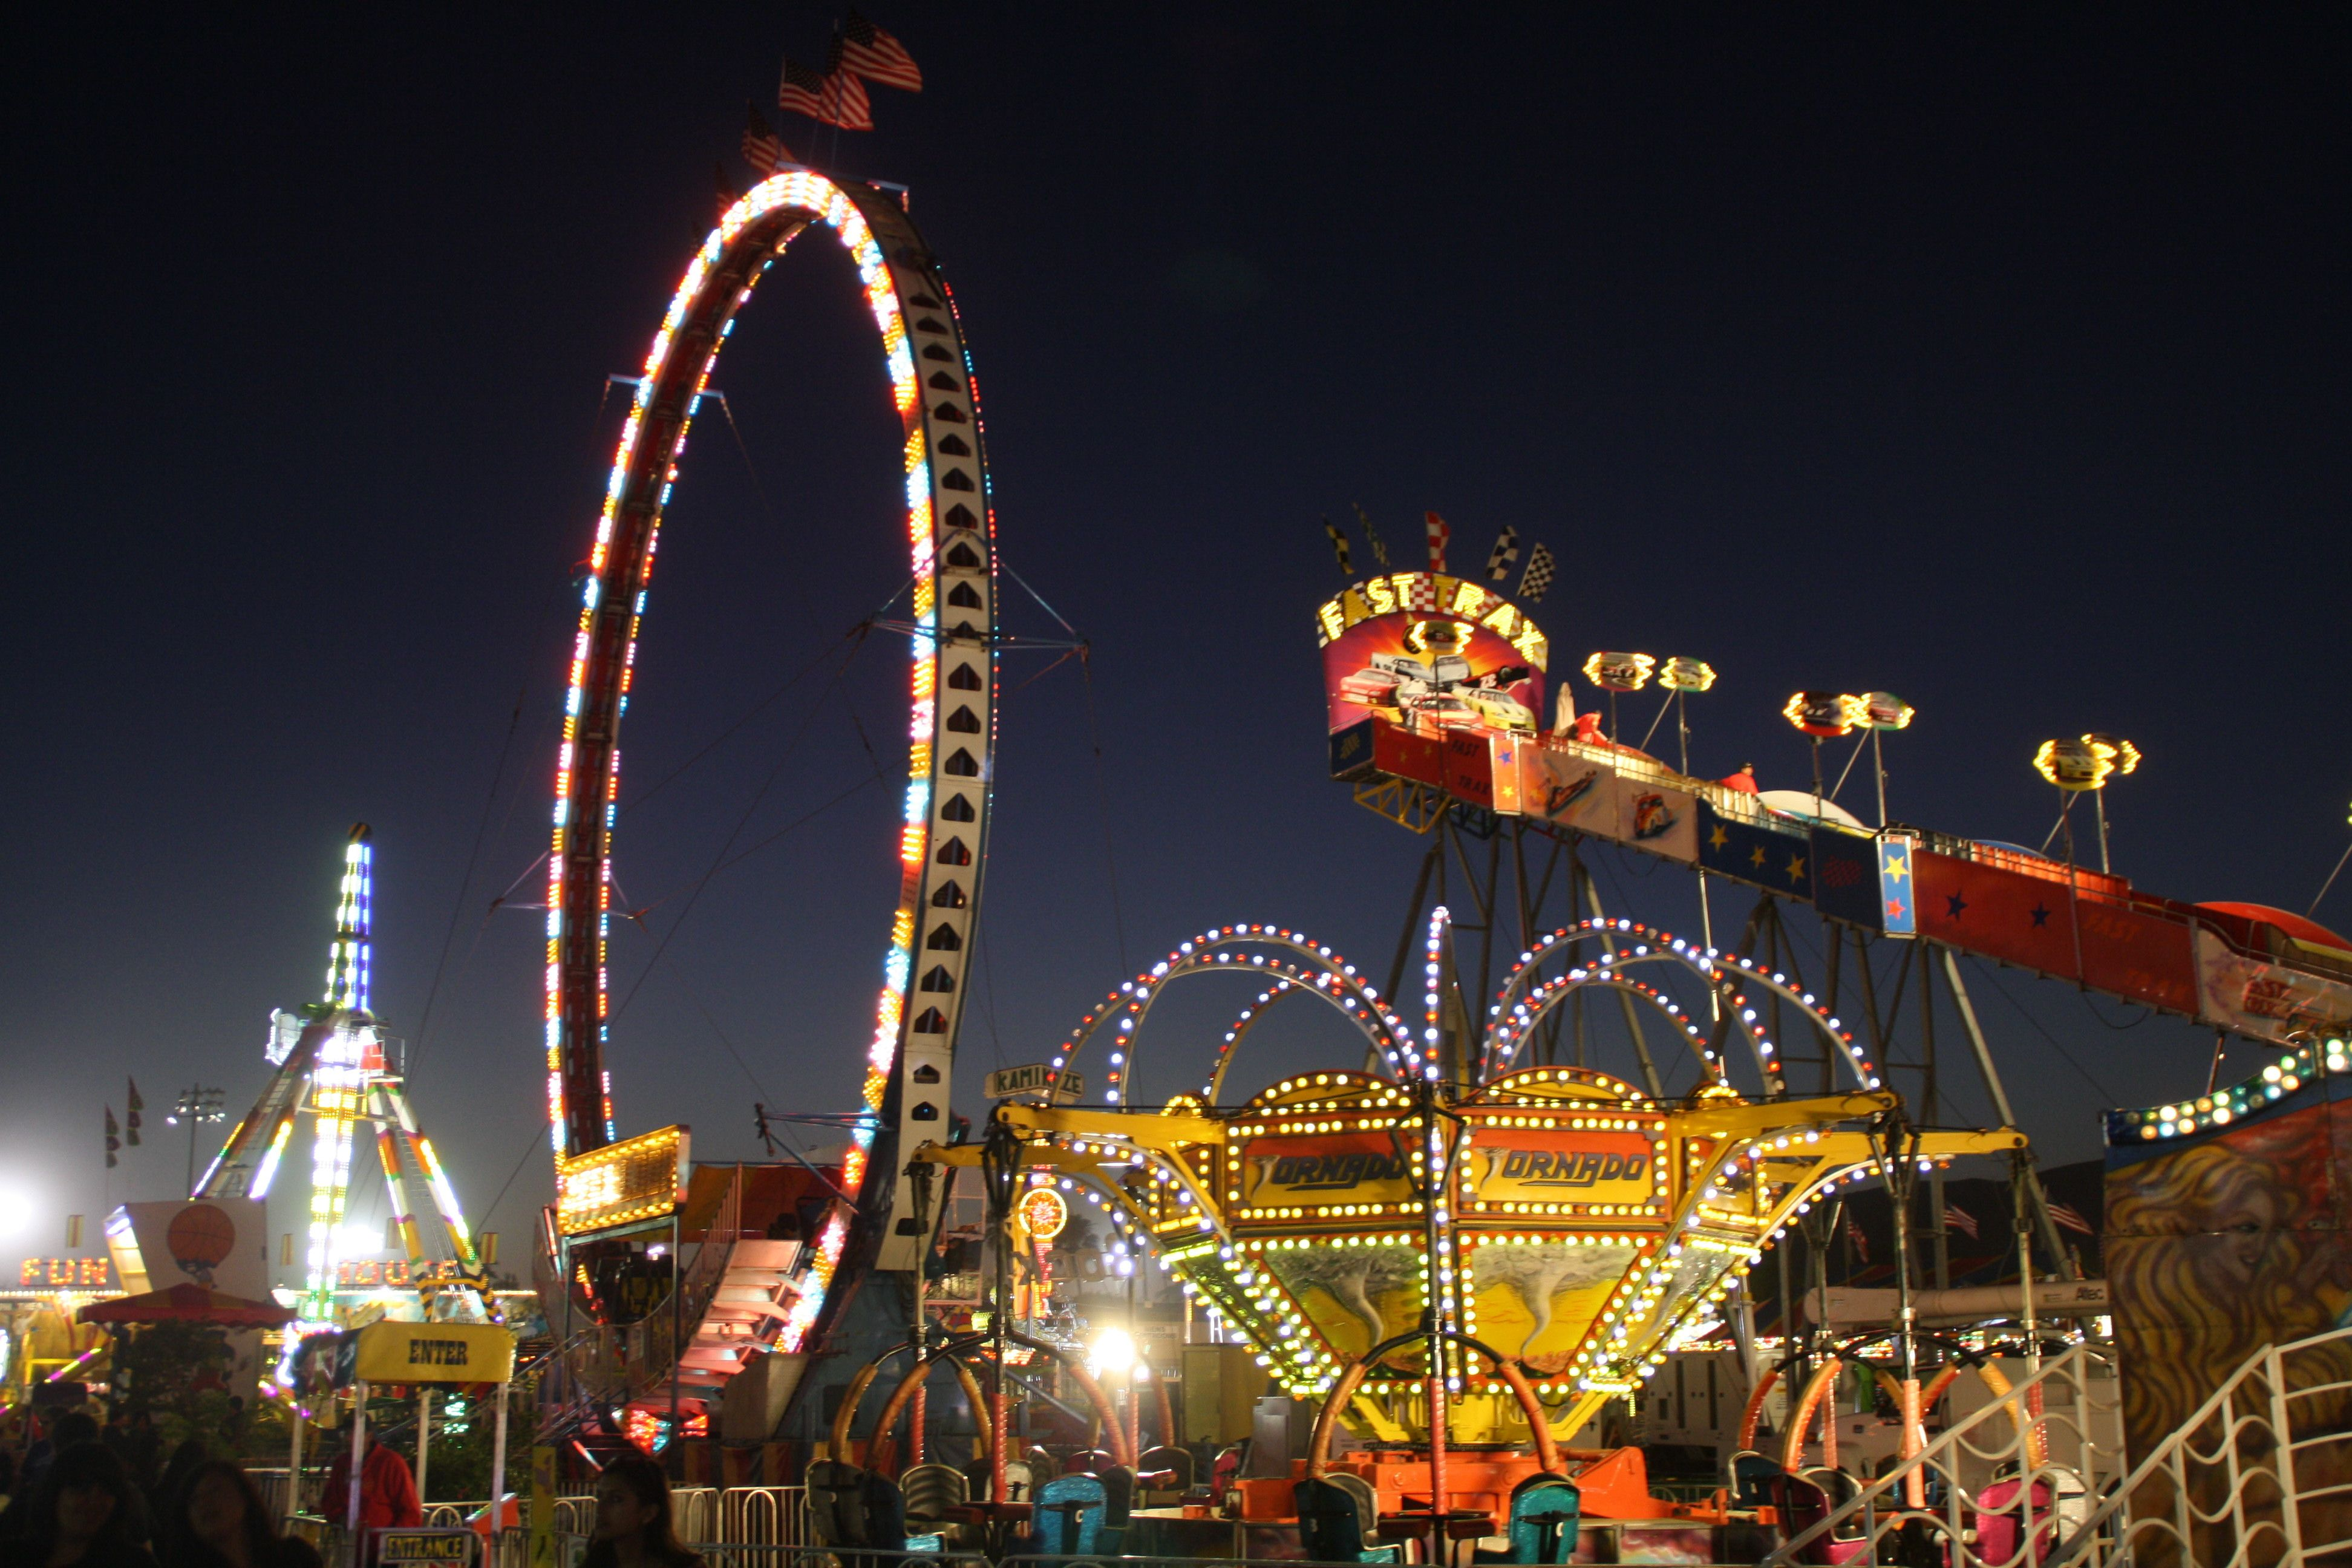 carnival midway at the ventura county fair. | fun at the fair